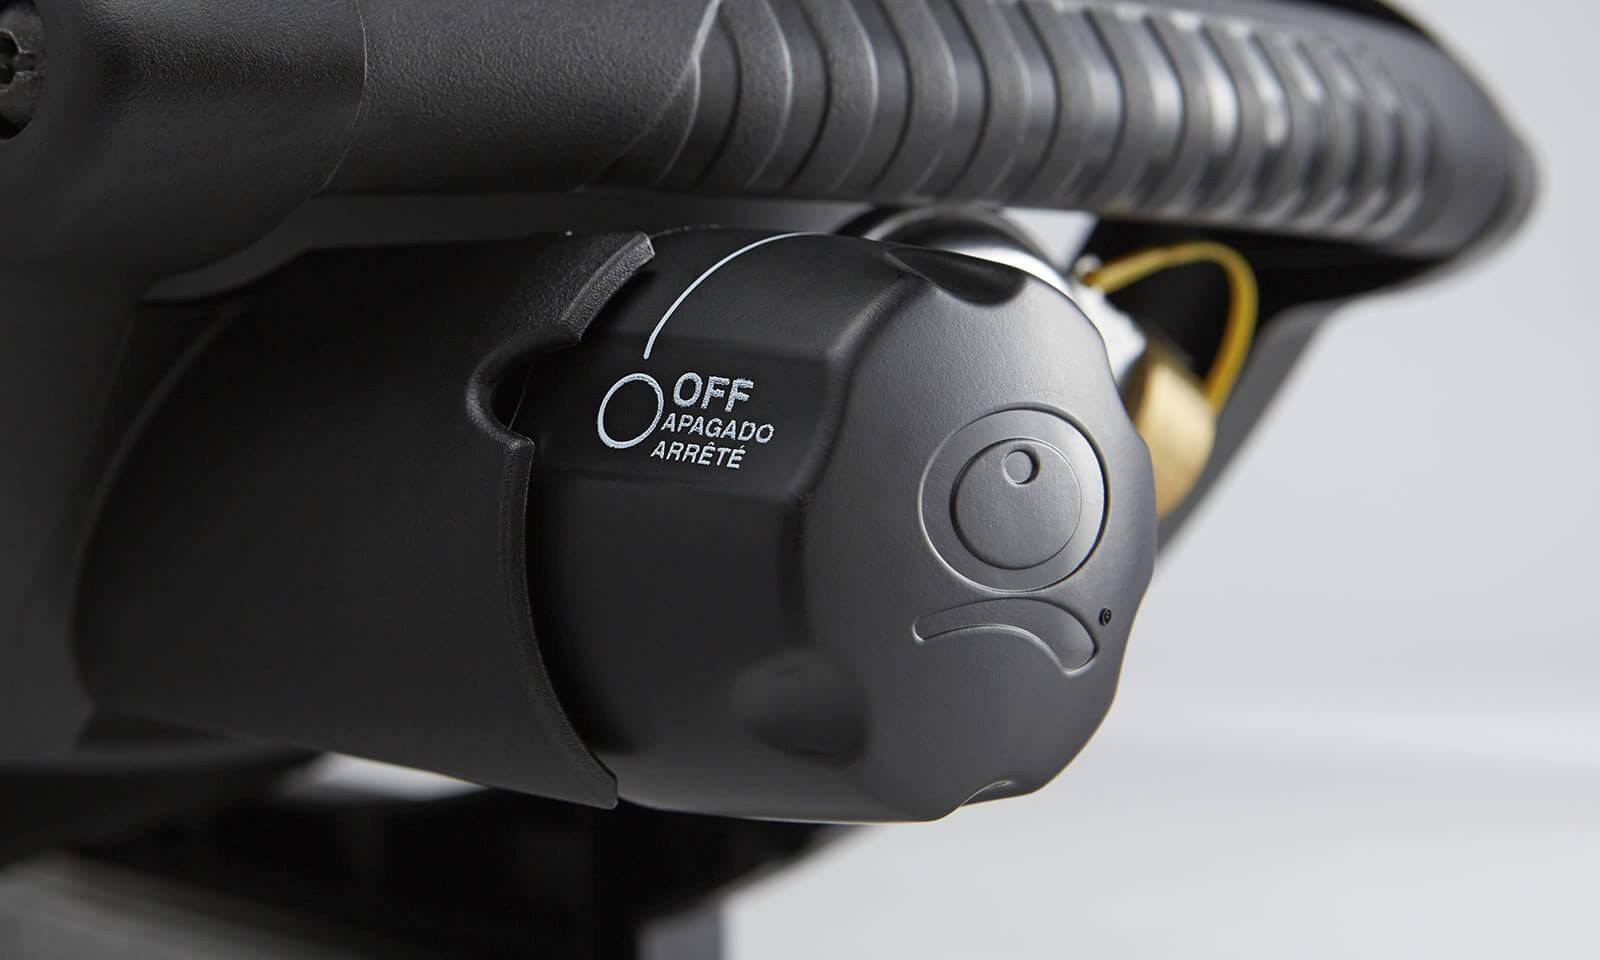 Infinite control burner valve